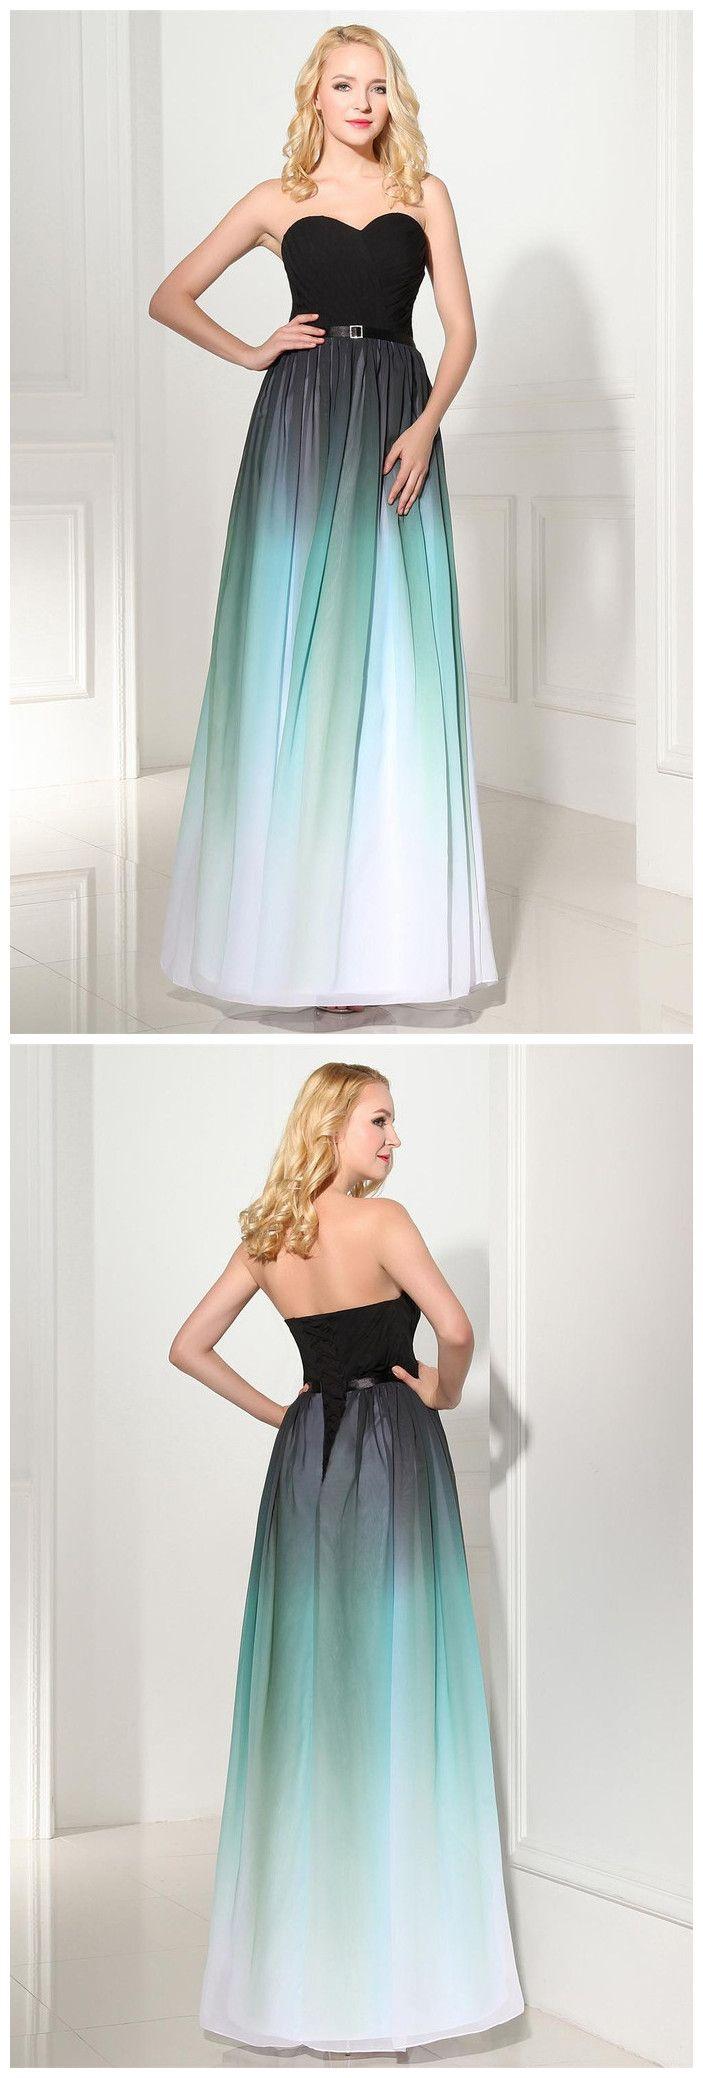 Sweetheart Prom Dress,Bandage Prom Dresses,Long Evening Dress